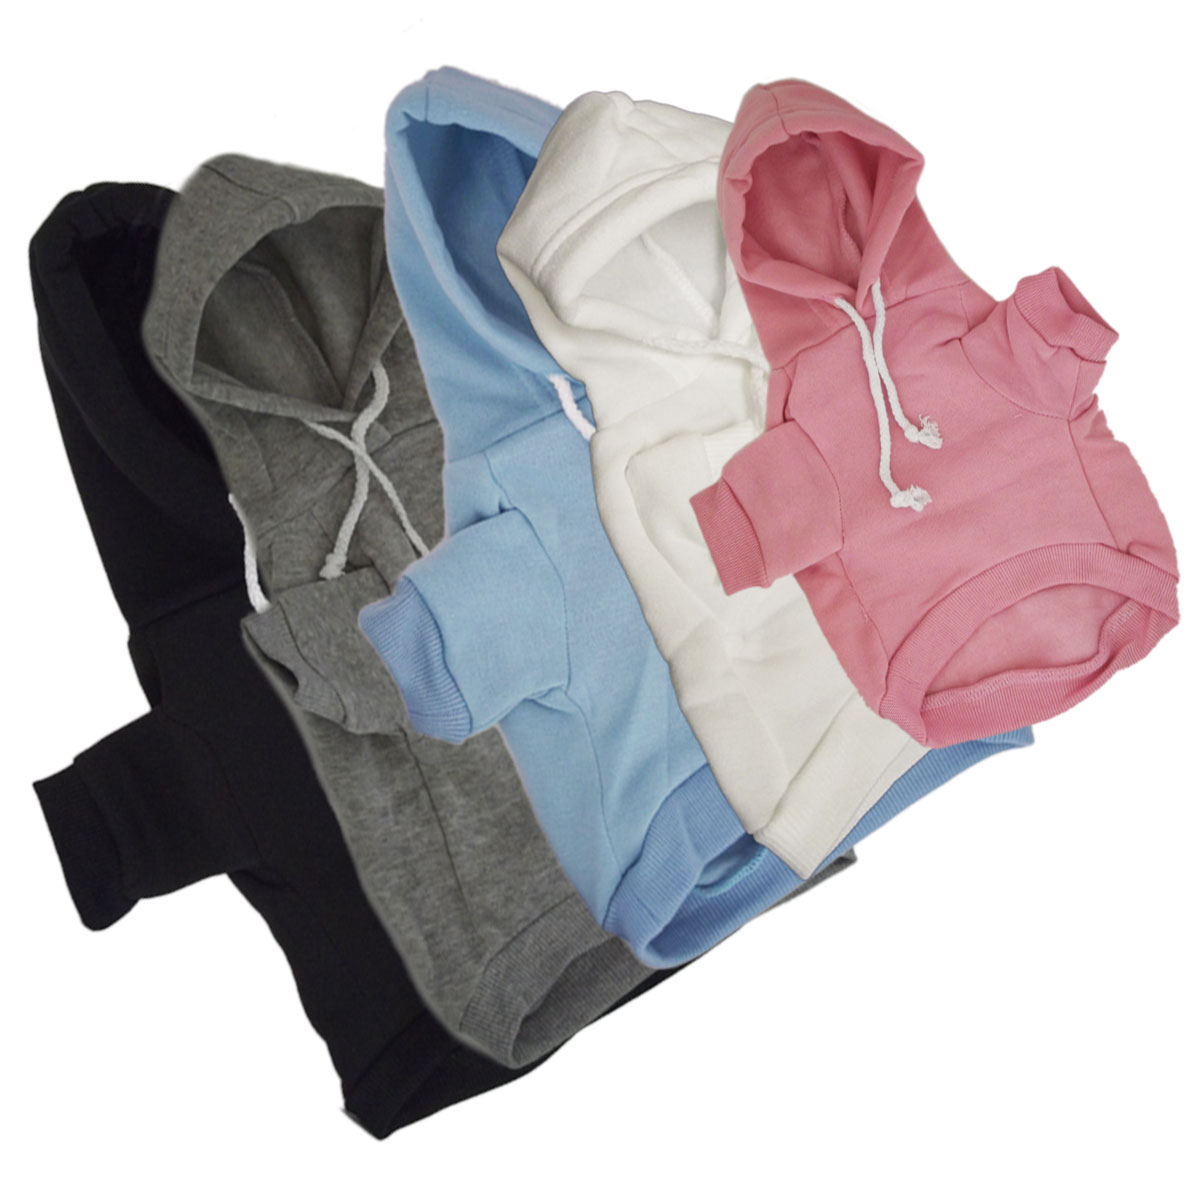 Hooded Pet Sweatshirt 296-1